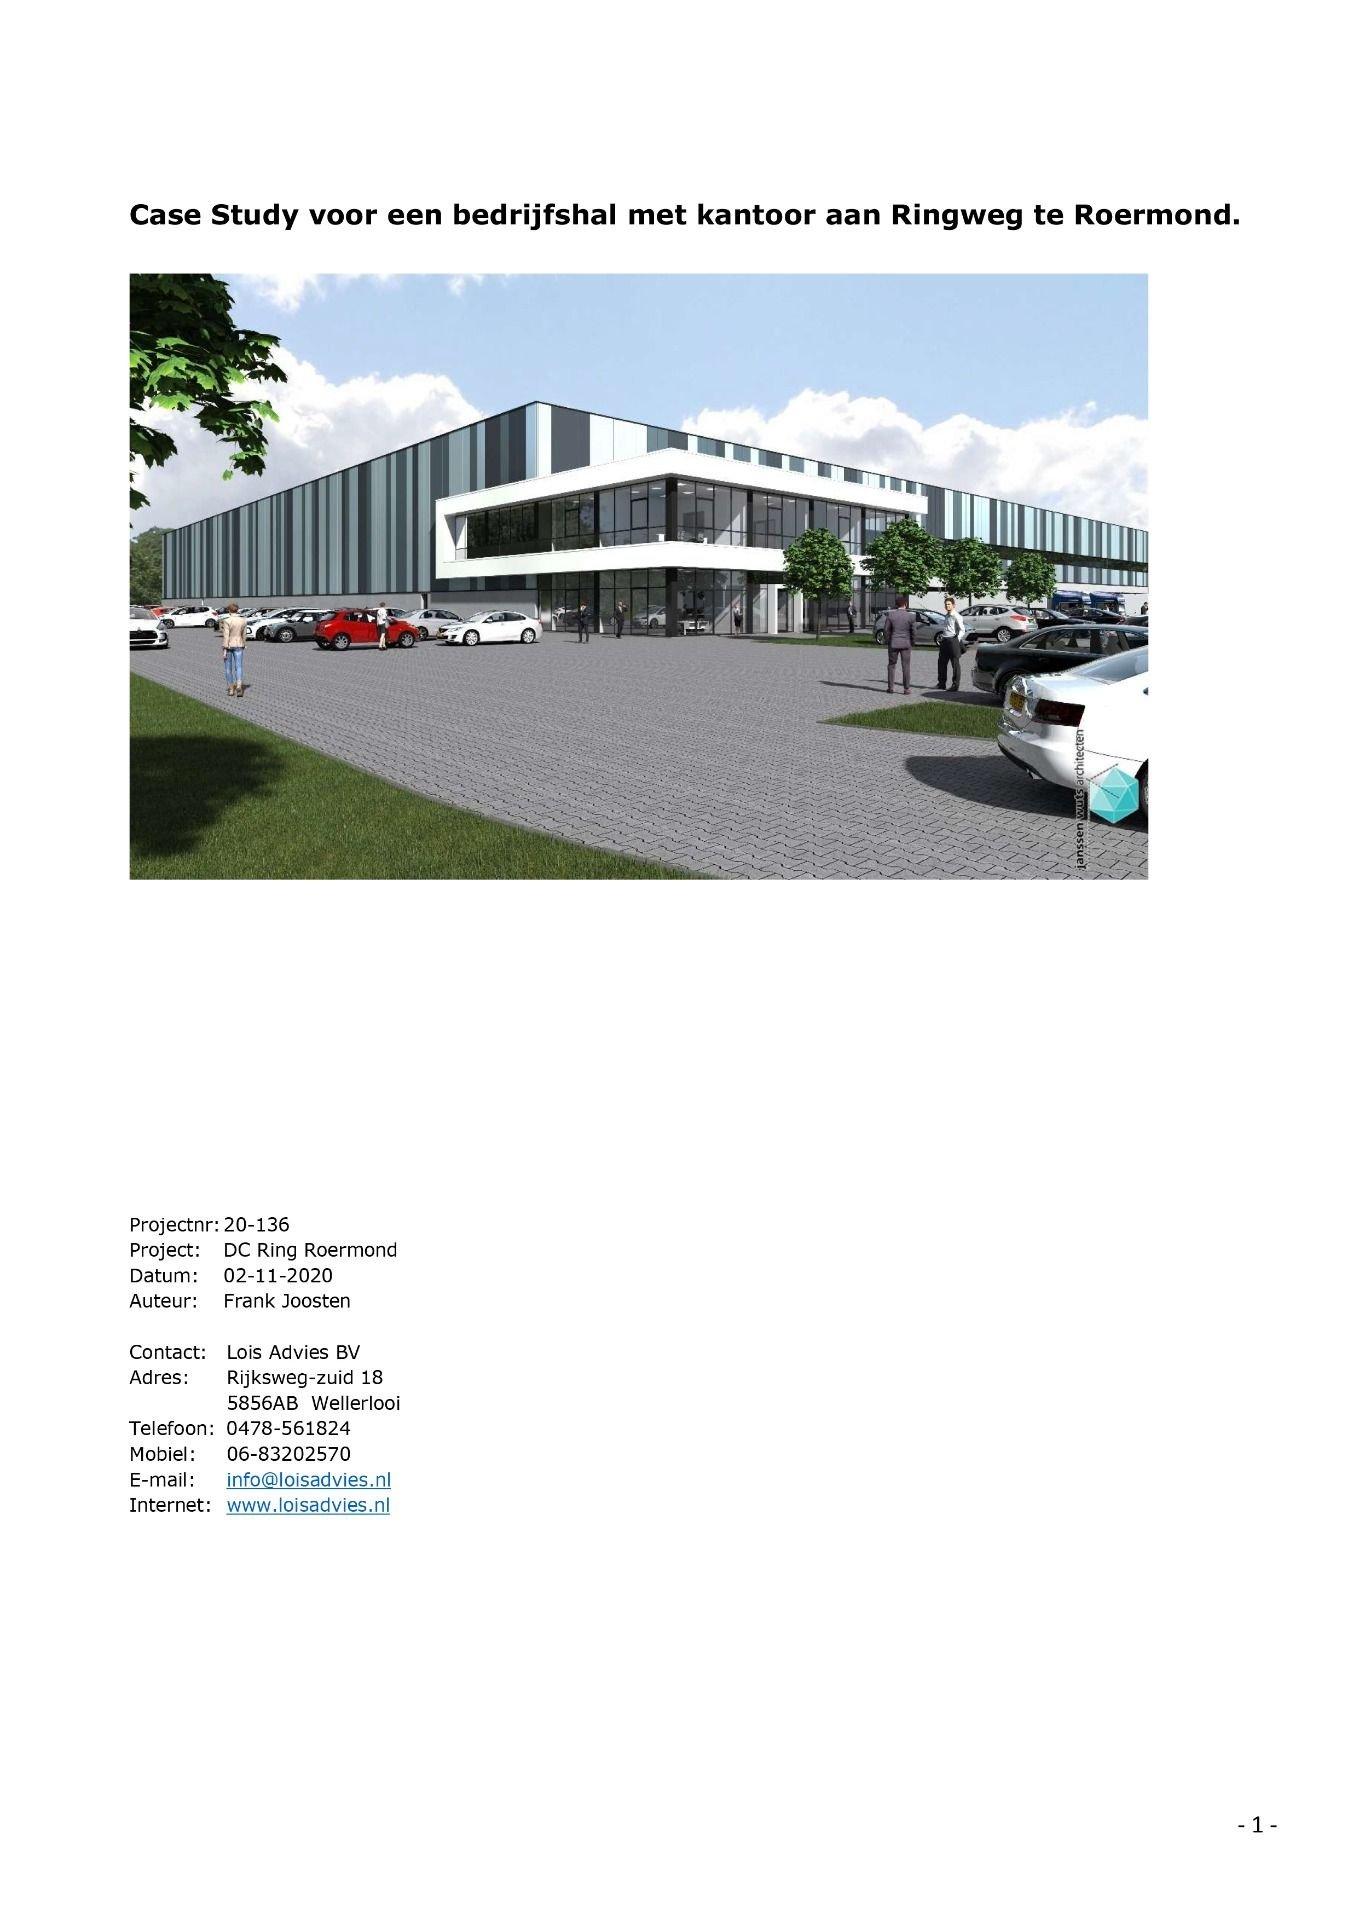 BREAAM Case Study Man9-1 voor Frasers Park, Roermond